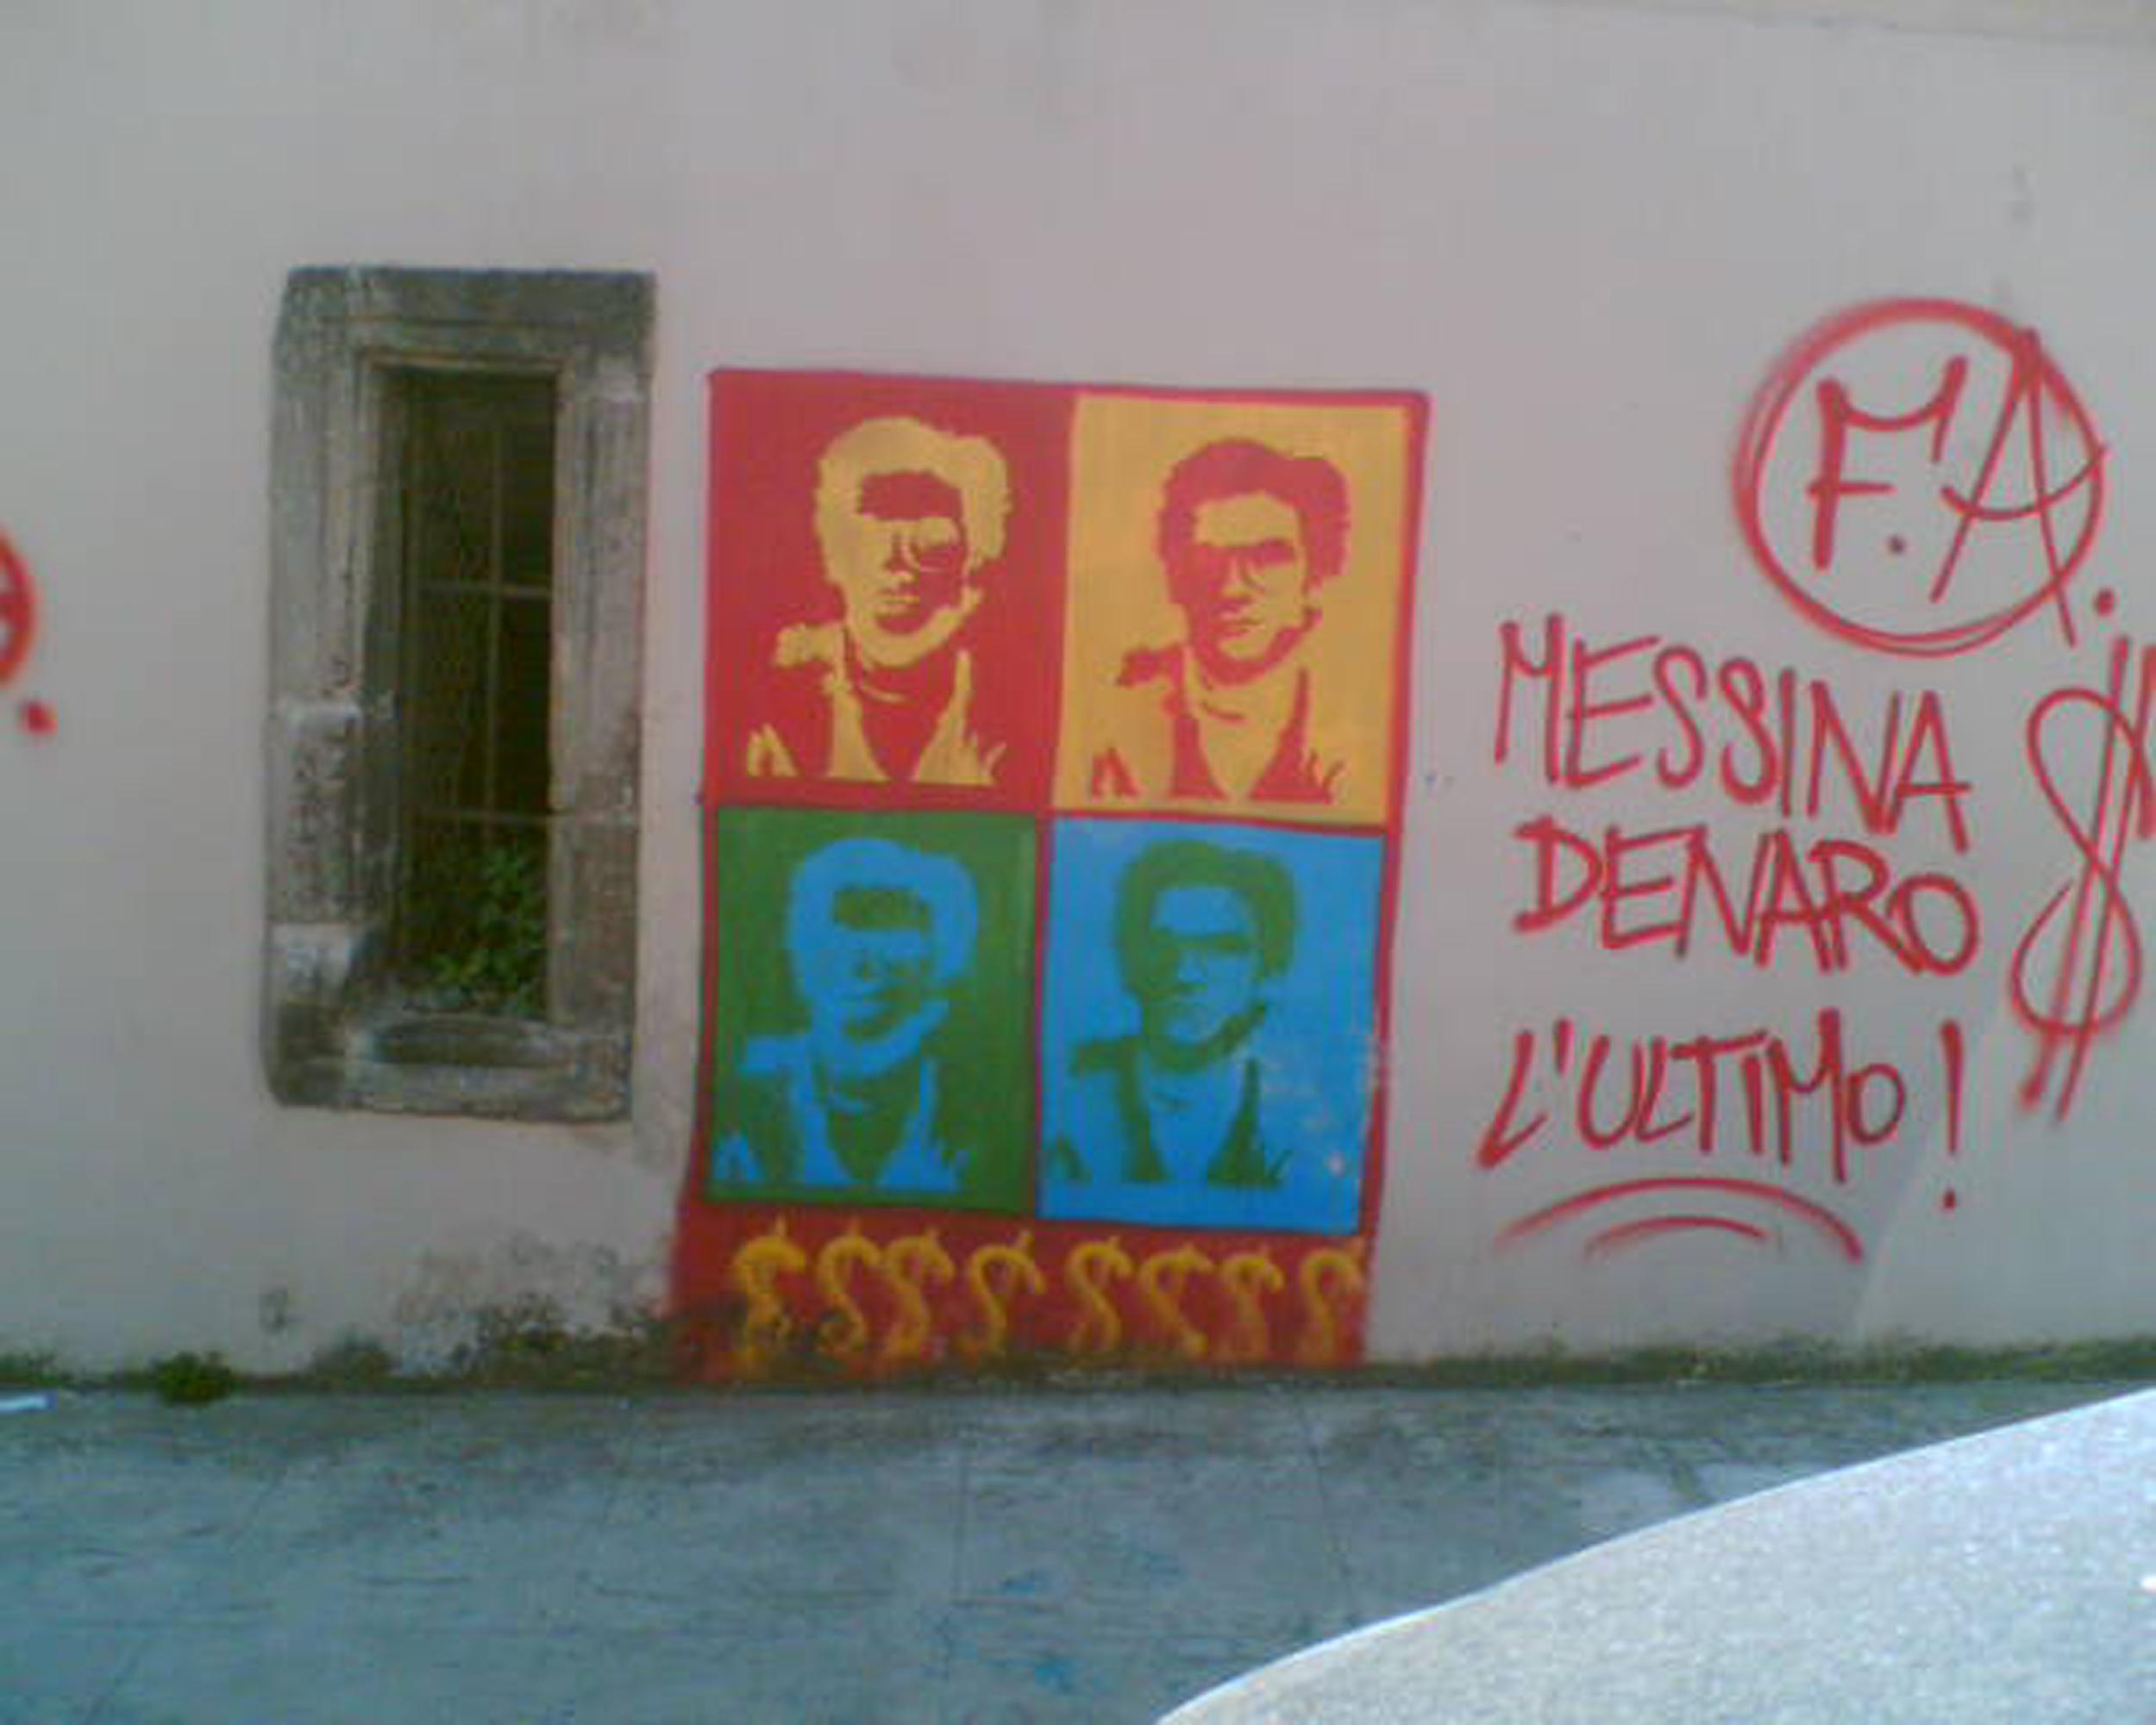 Matteo Messina Denaro Graffito